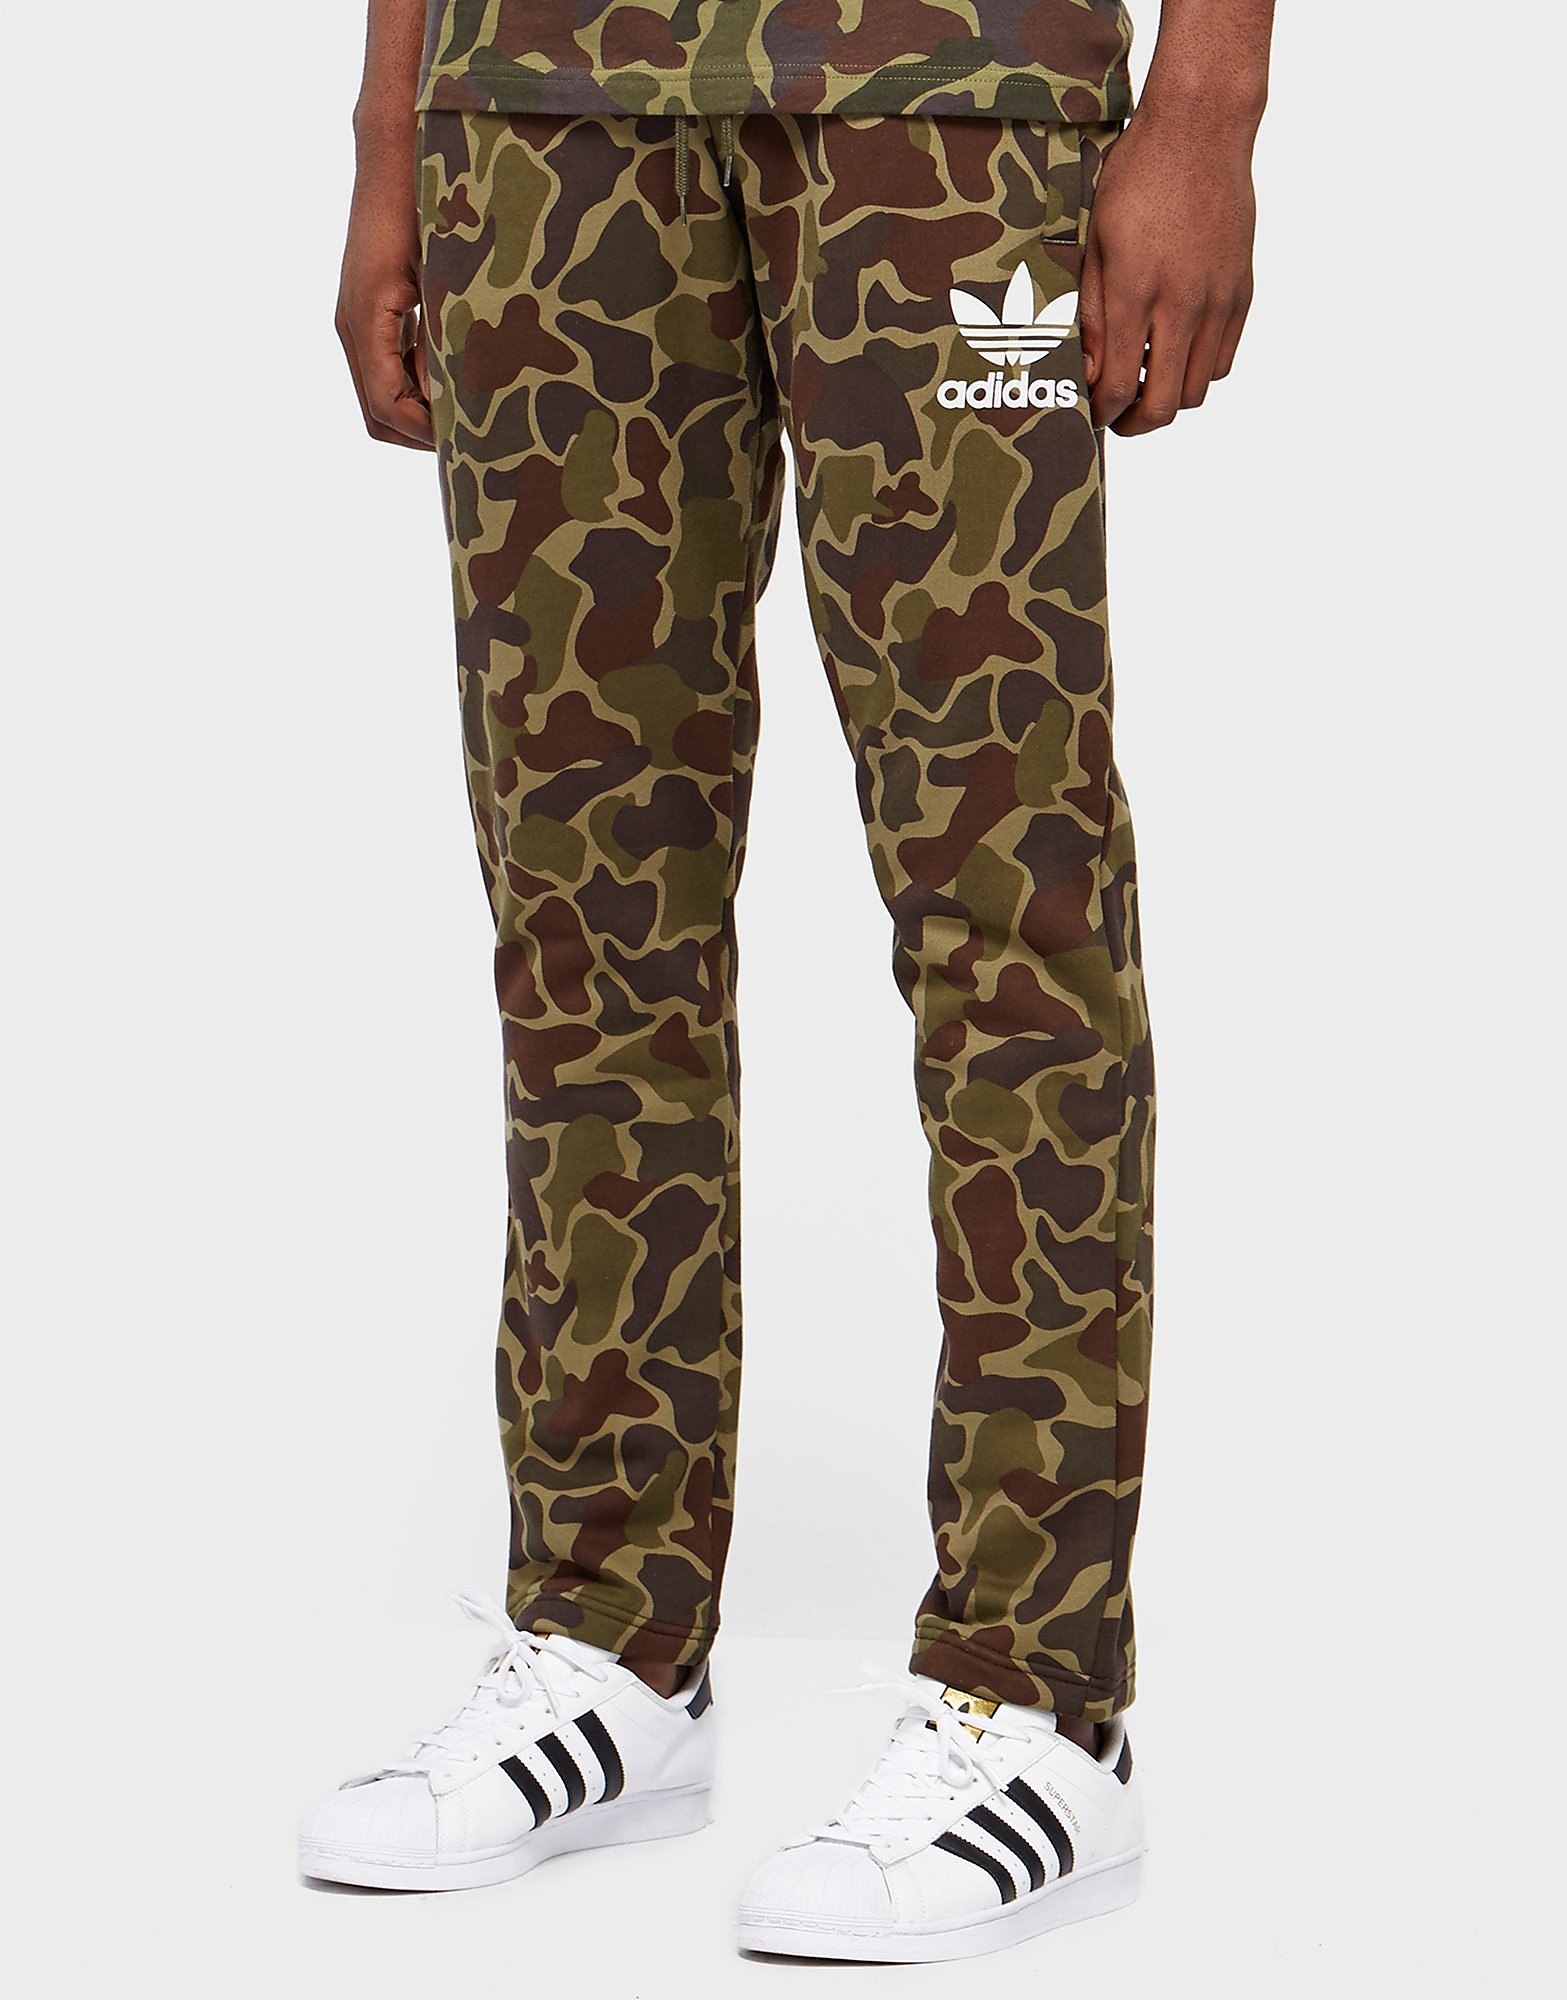 adidas Originals Camo Track Pants